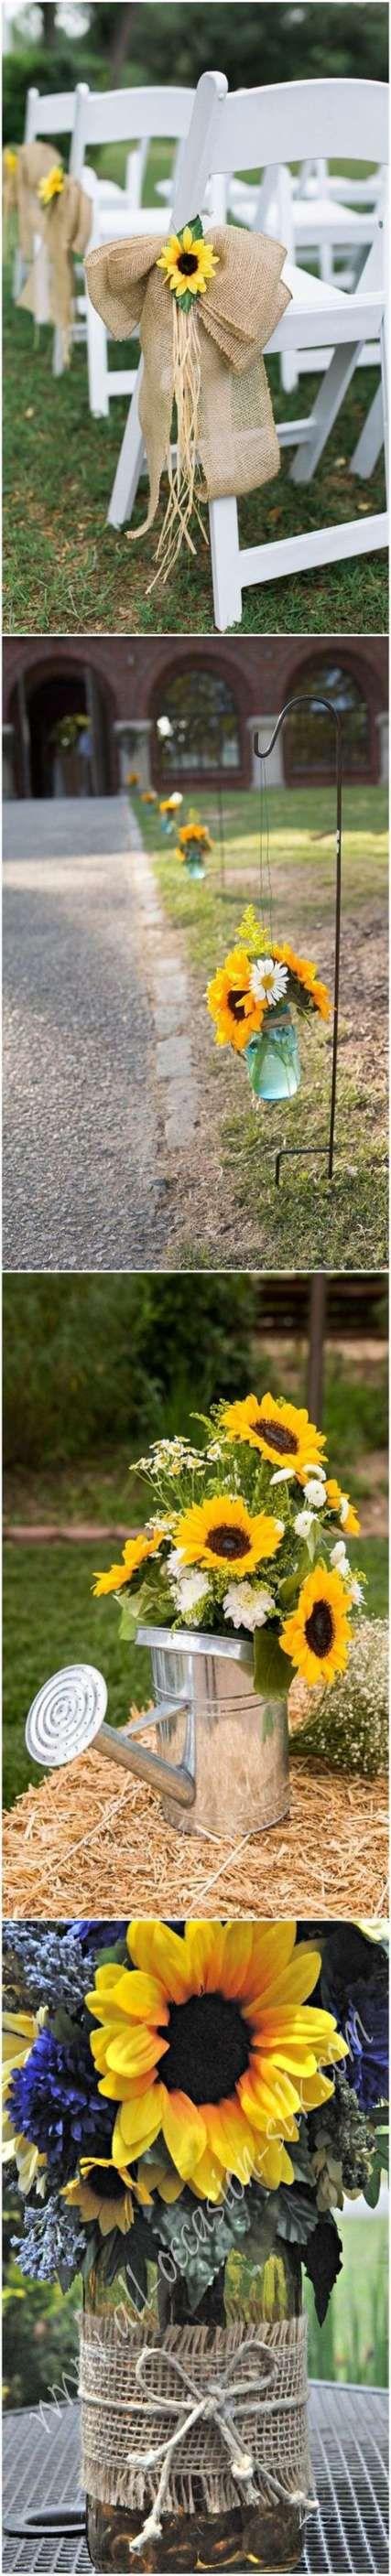 42+ Ideas For Wedding Sunflower Ideas Fall Sunflower